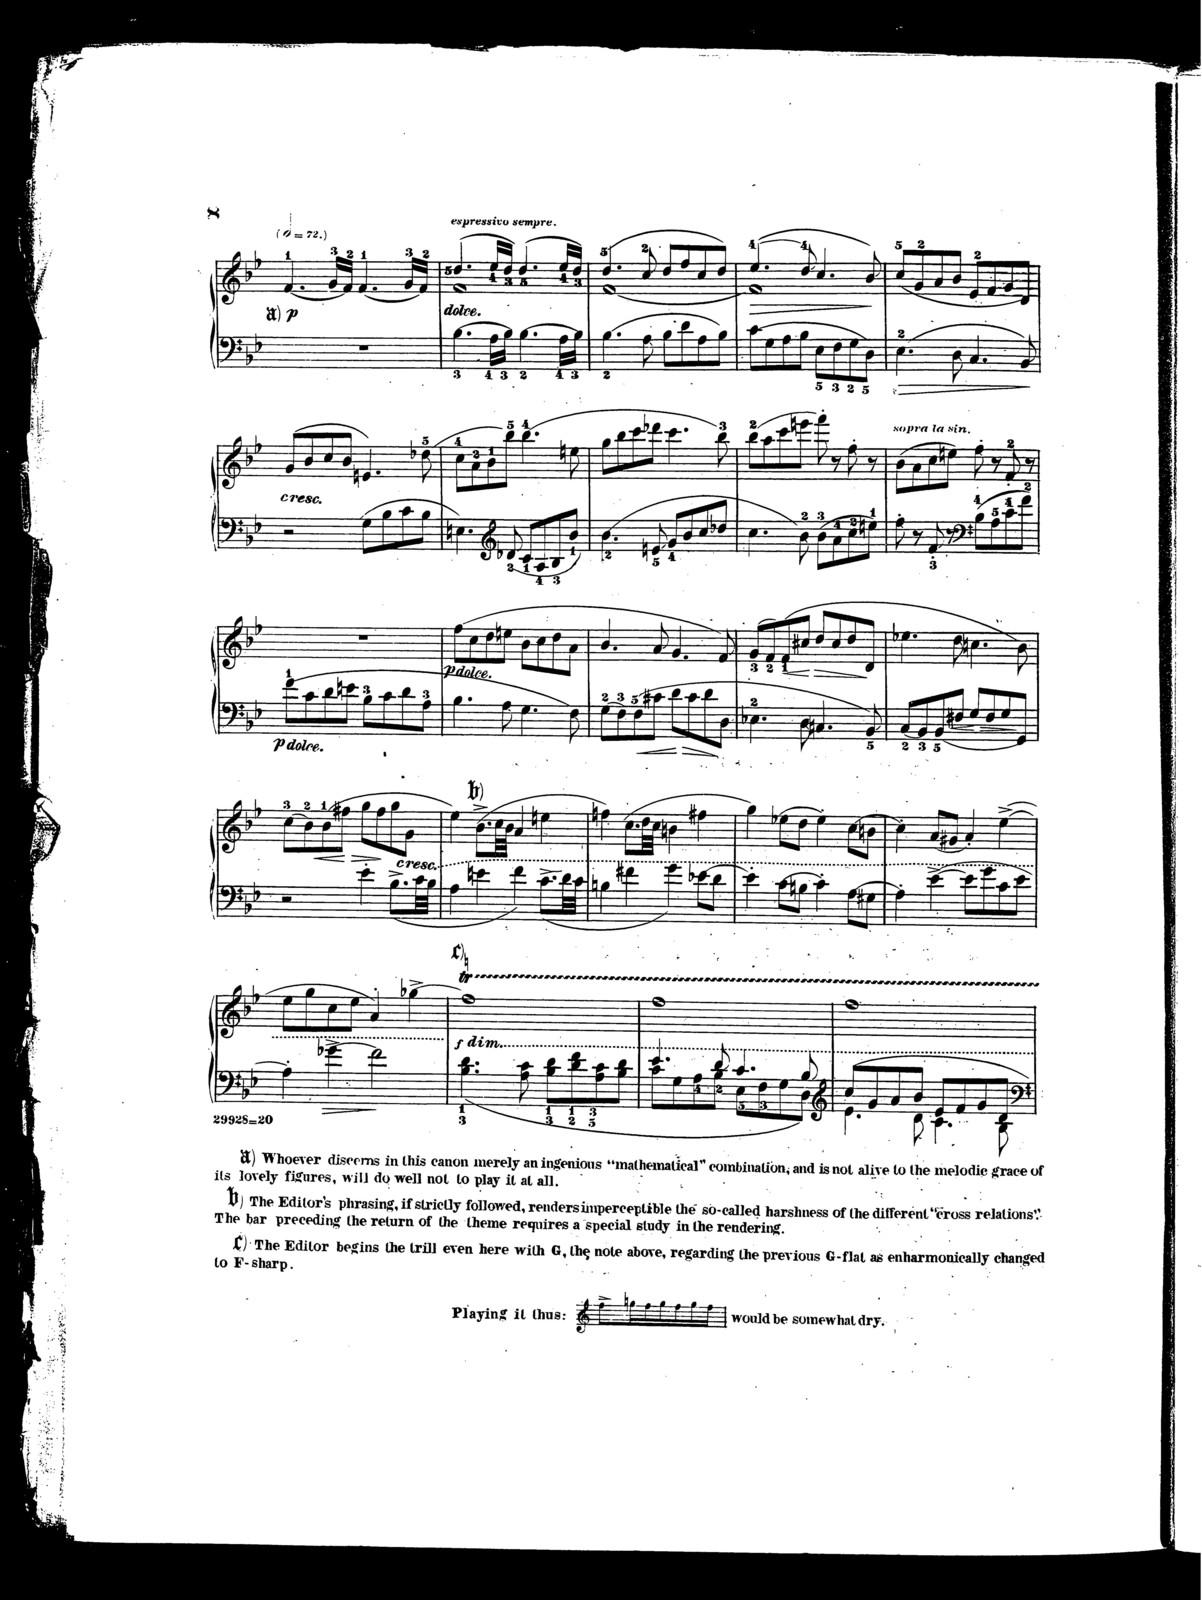 Beethoven's Sonatas, op. 101